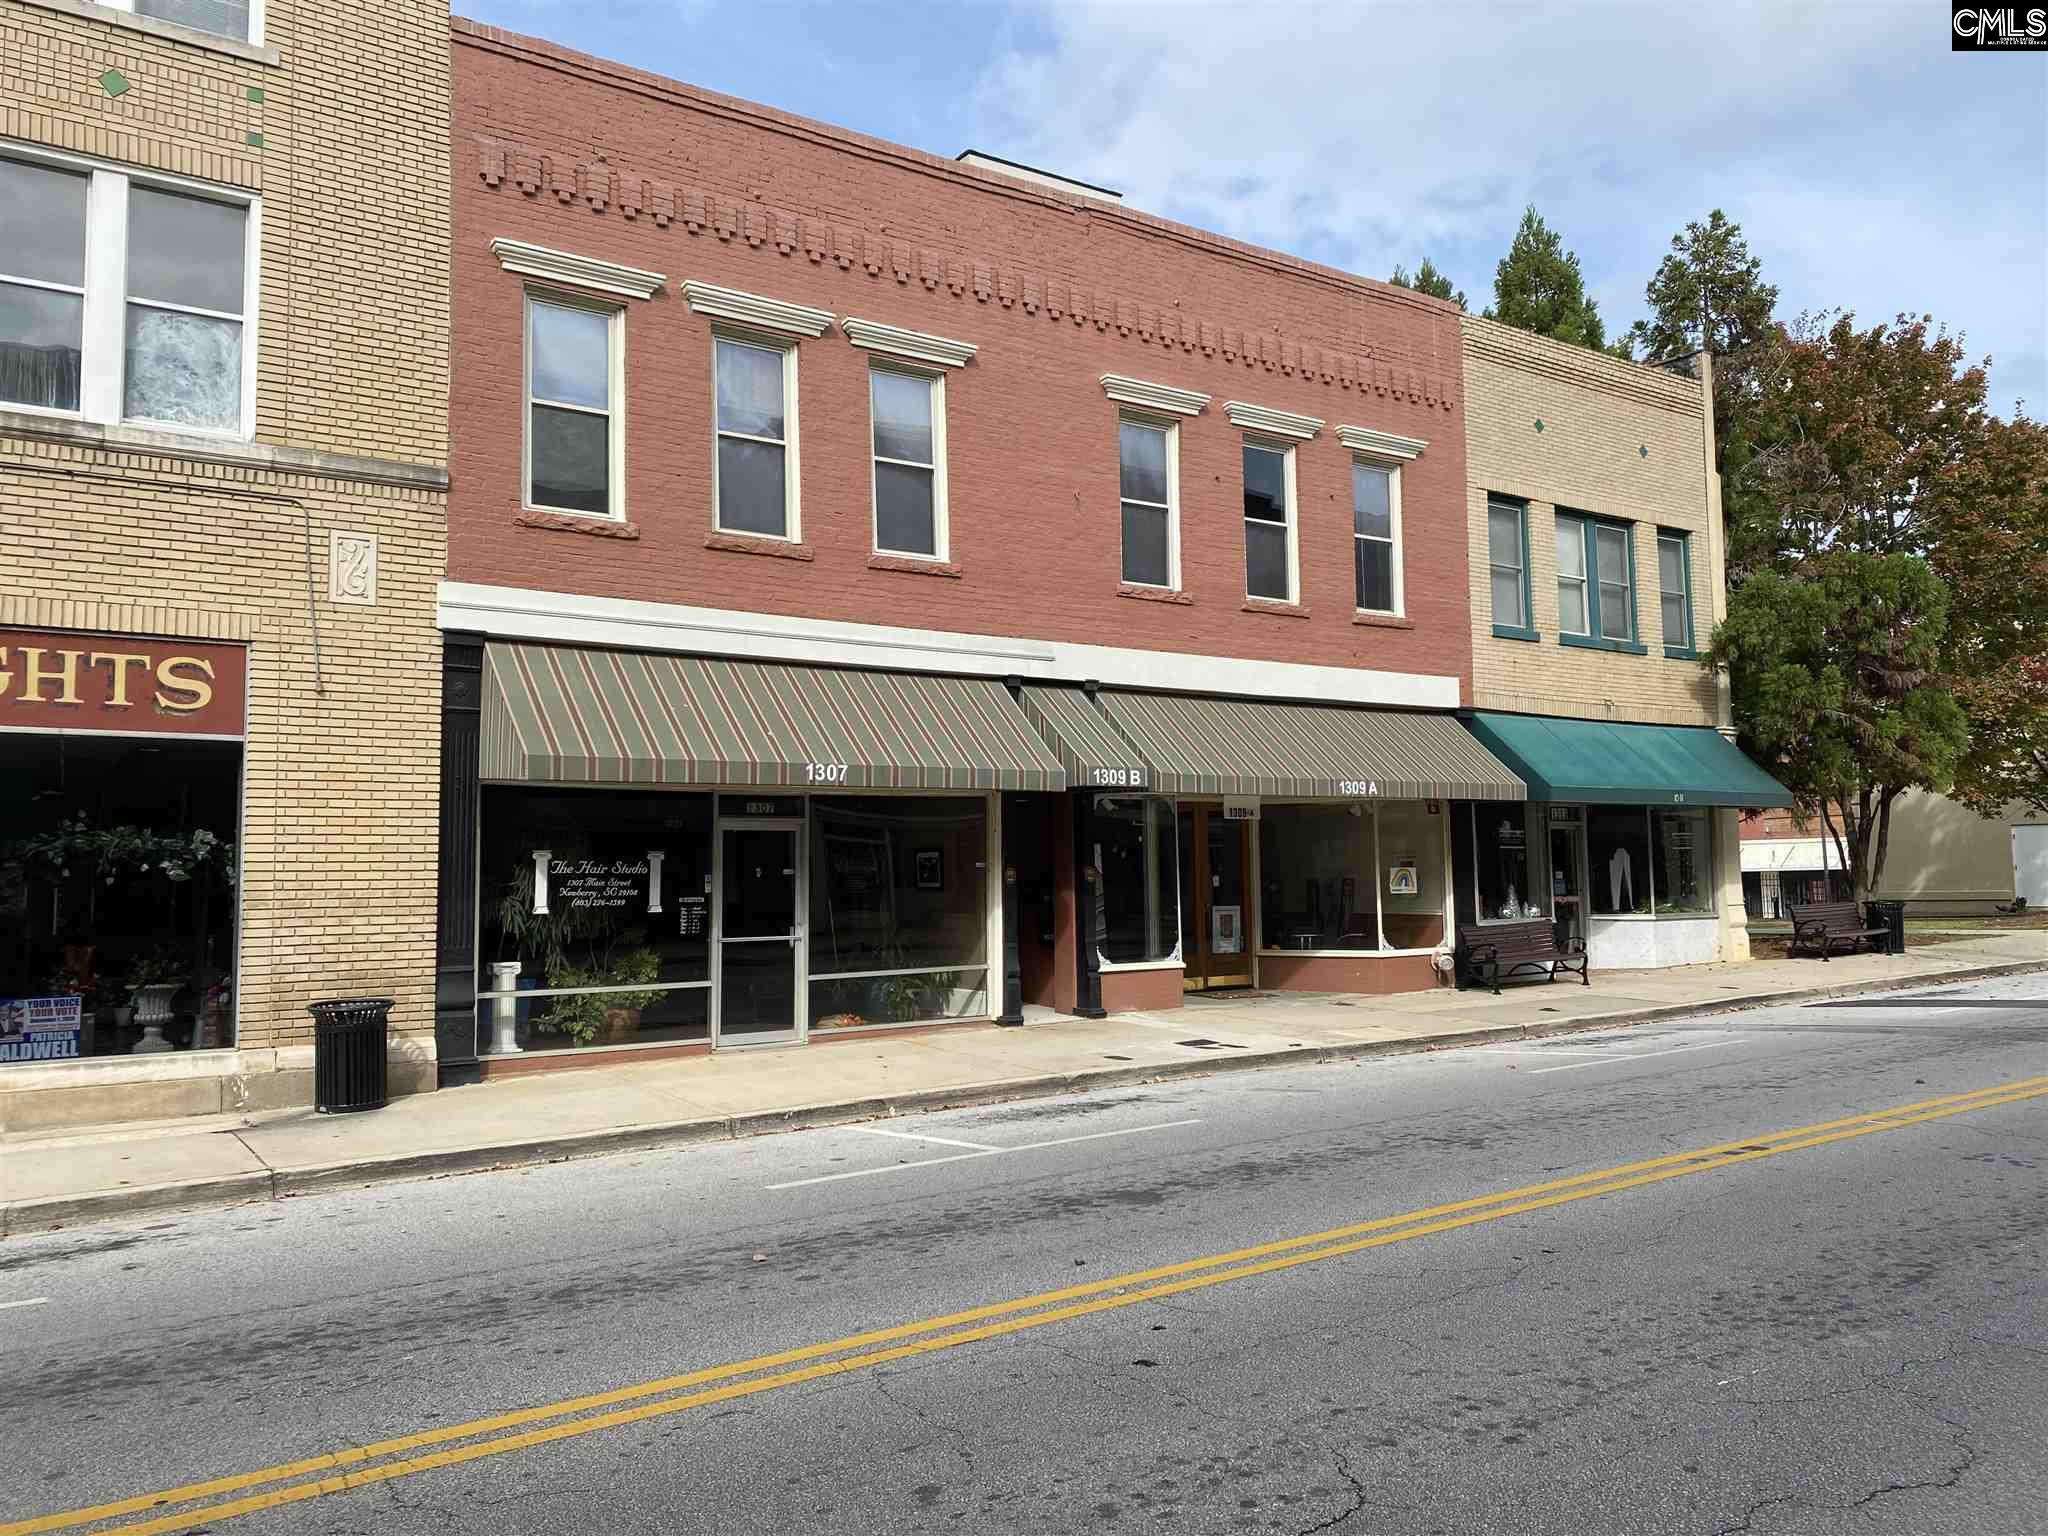 1307 & 130 Main Street Newberry, SC 29108